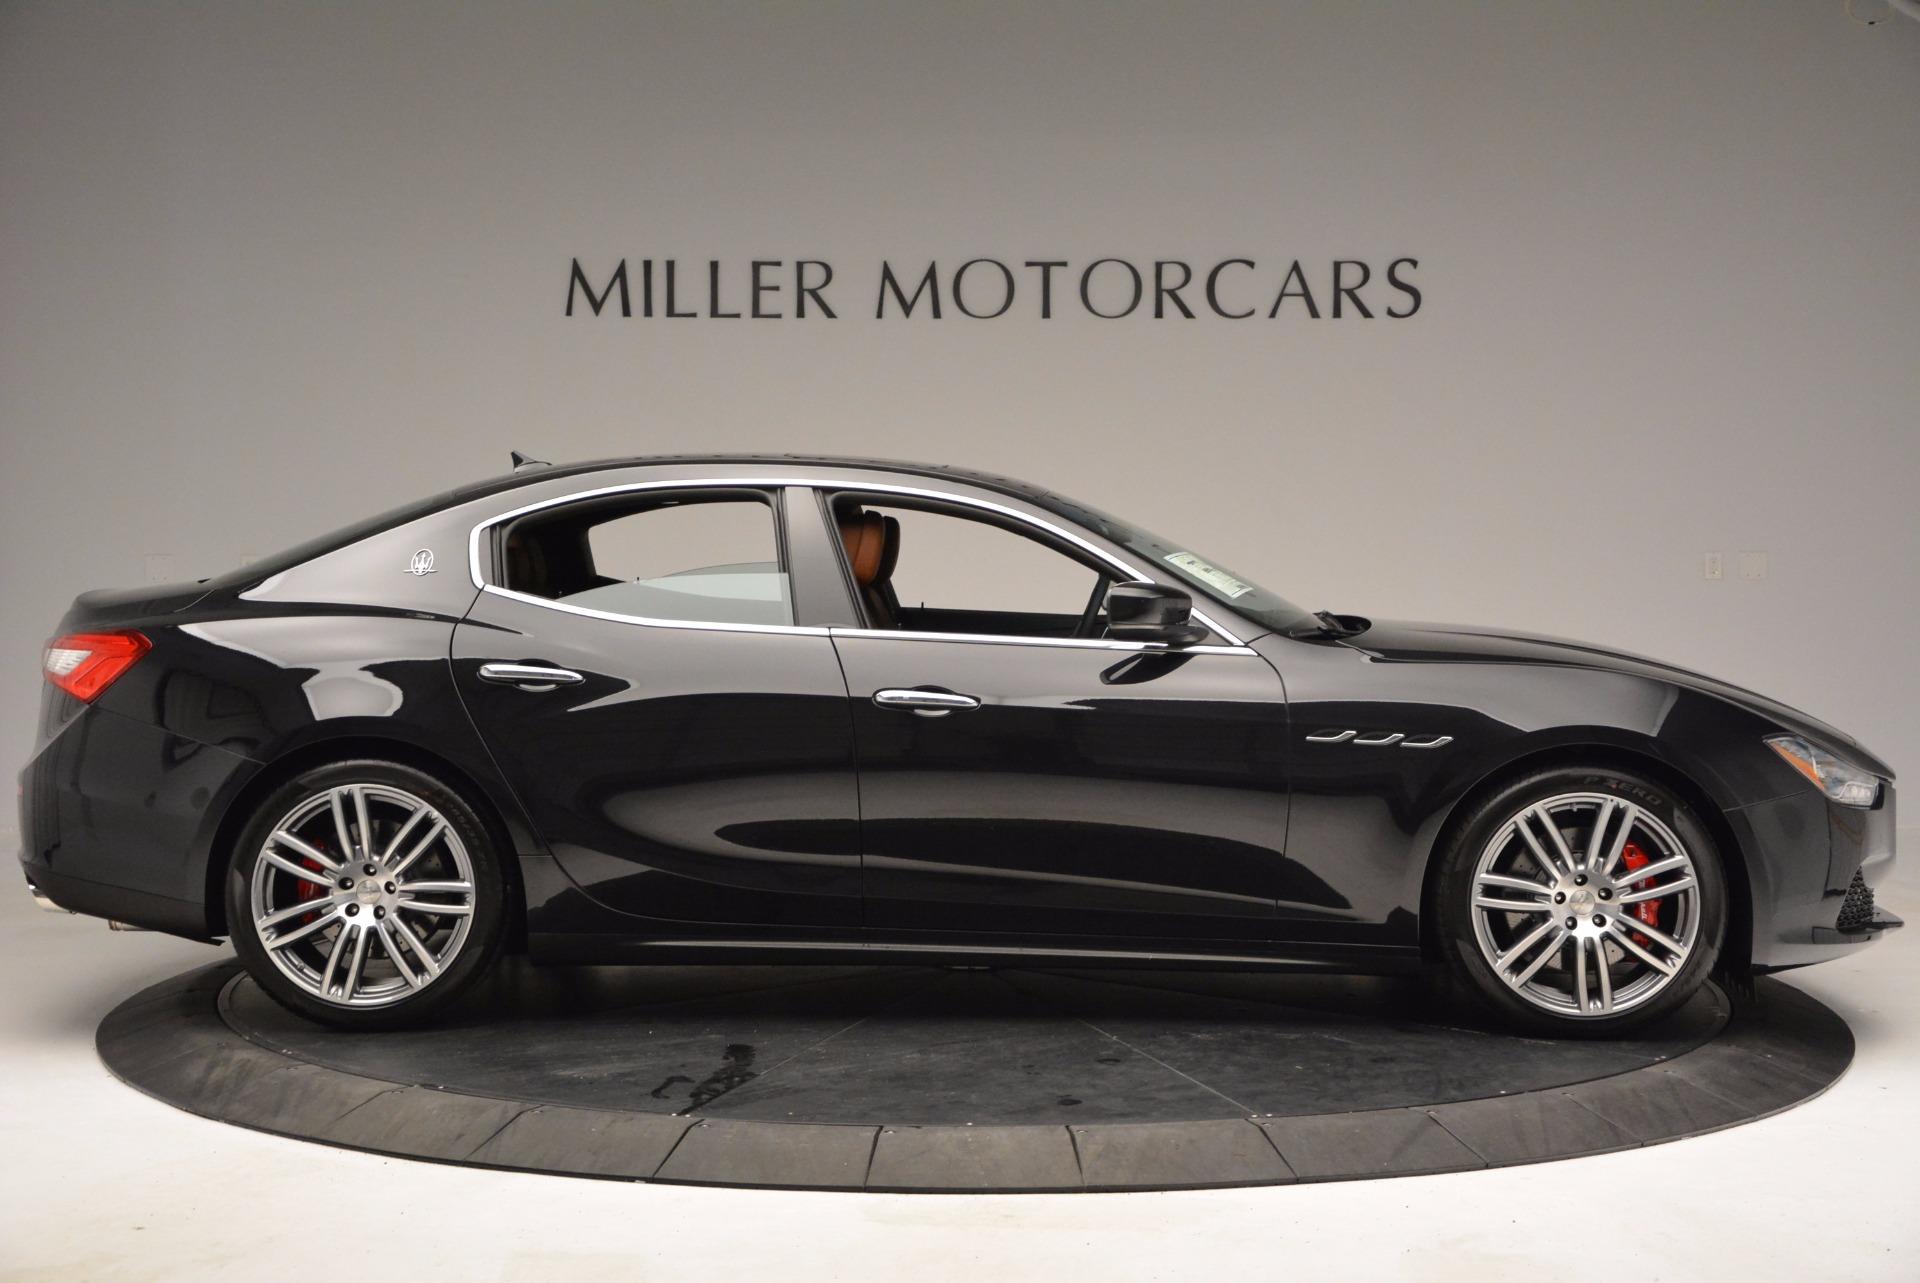 Used 2014 Maserati Ghibli S Q4 For Sale In Greenwich, CT. Alfa Romeo of Greenwich, 7281 1587_p9